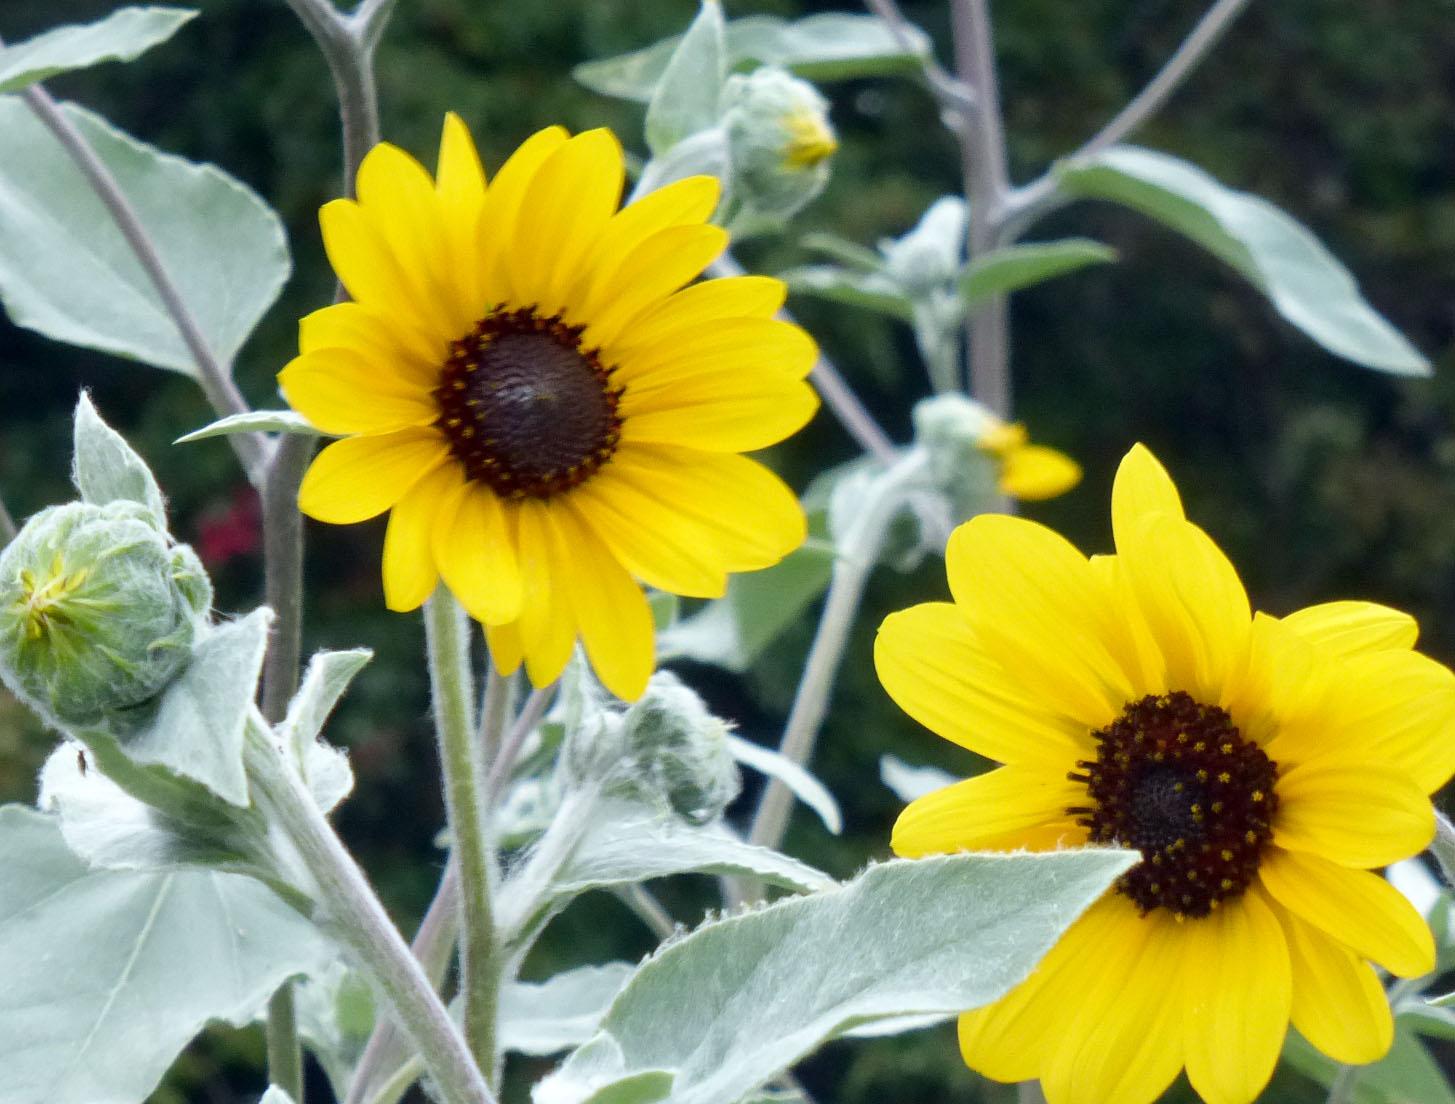 Silverleaf Sunflower 1 g Southern Exposure Seed Exchange